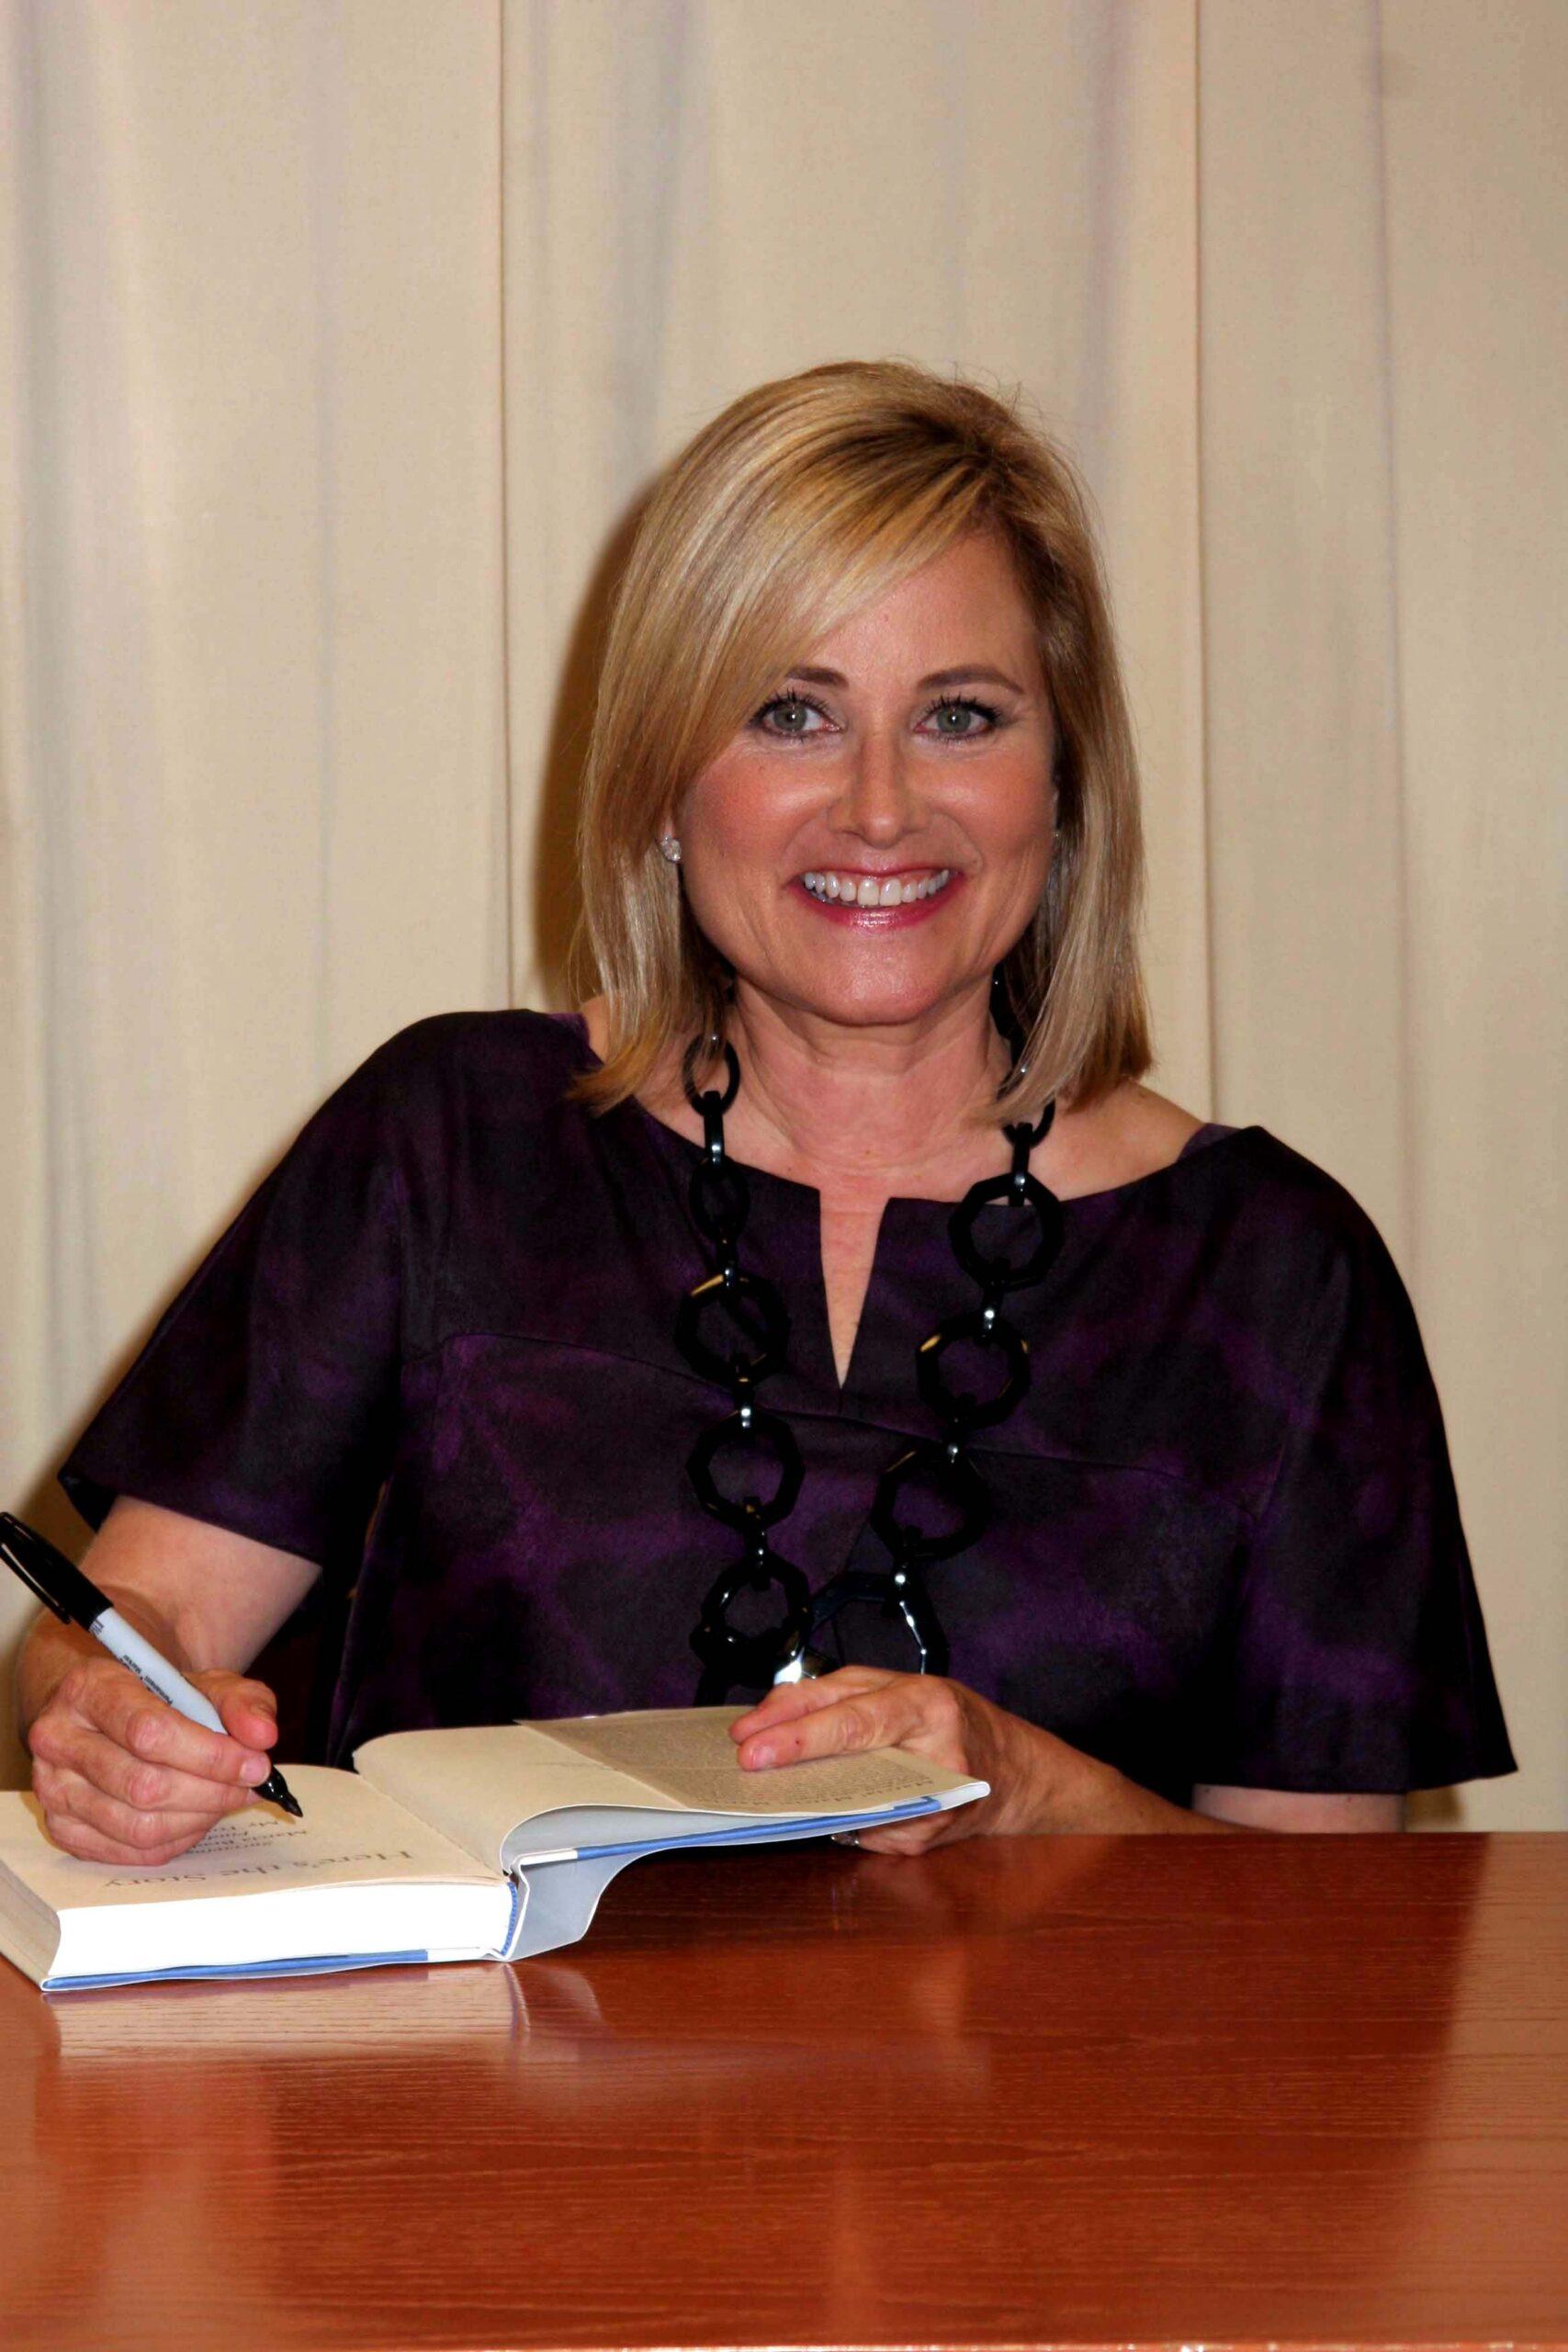 maureen mccormick signing books